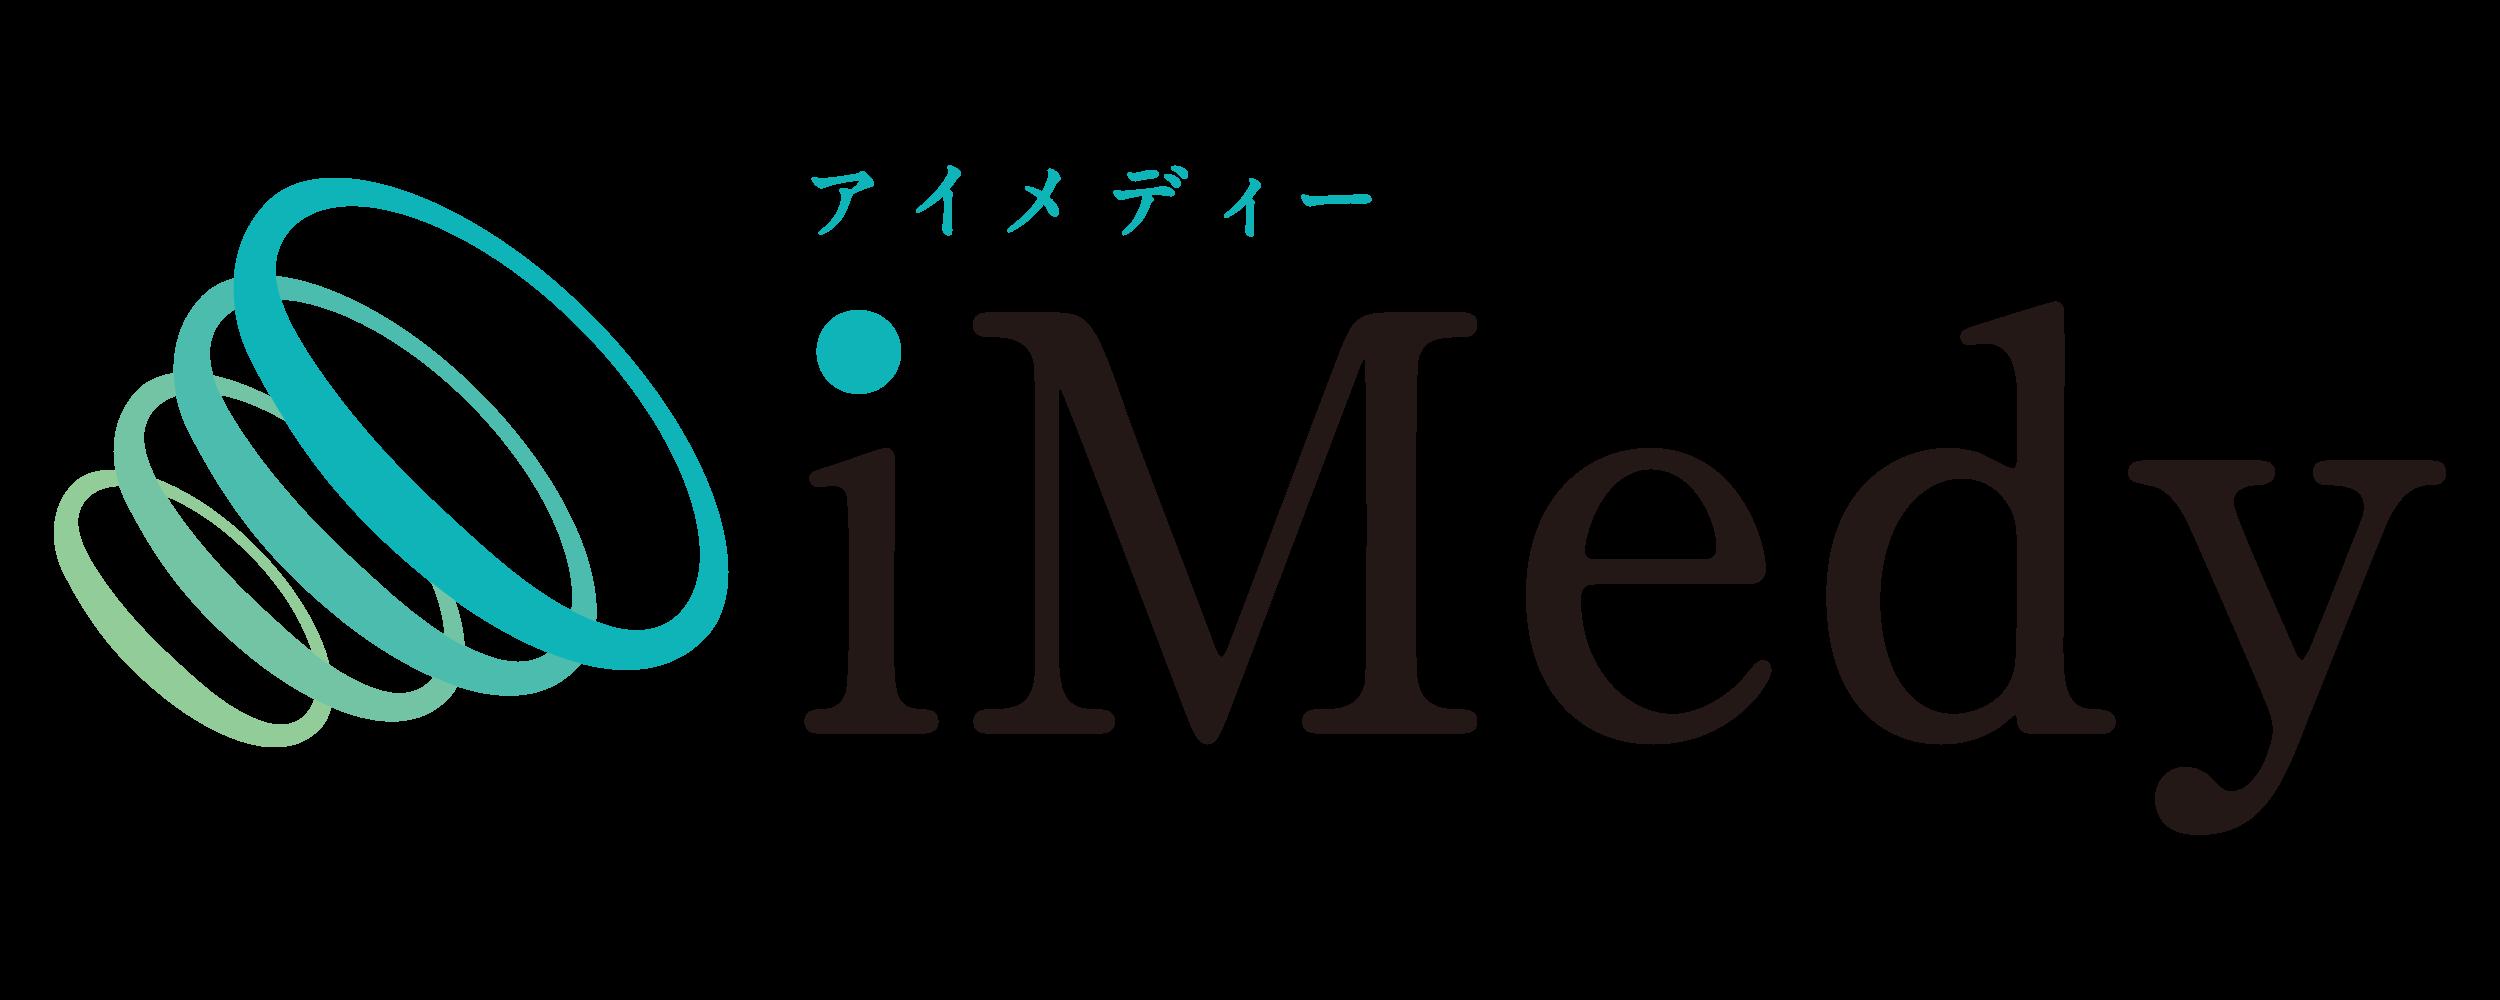 iMedy株式会社